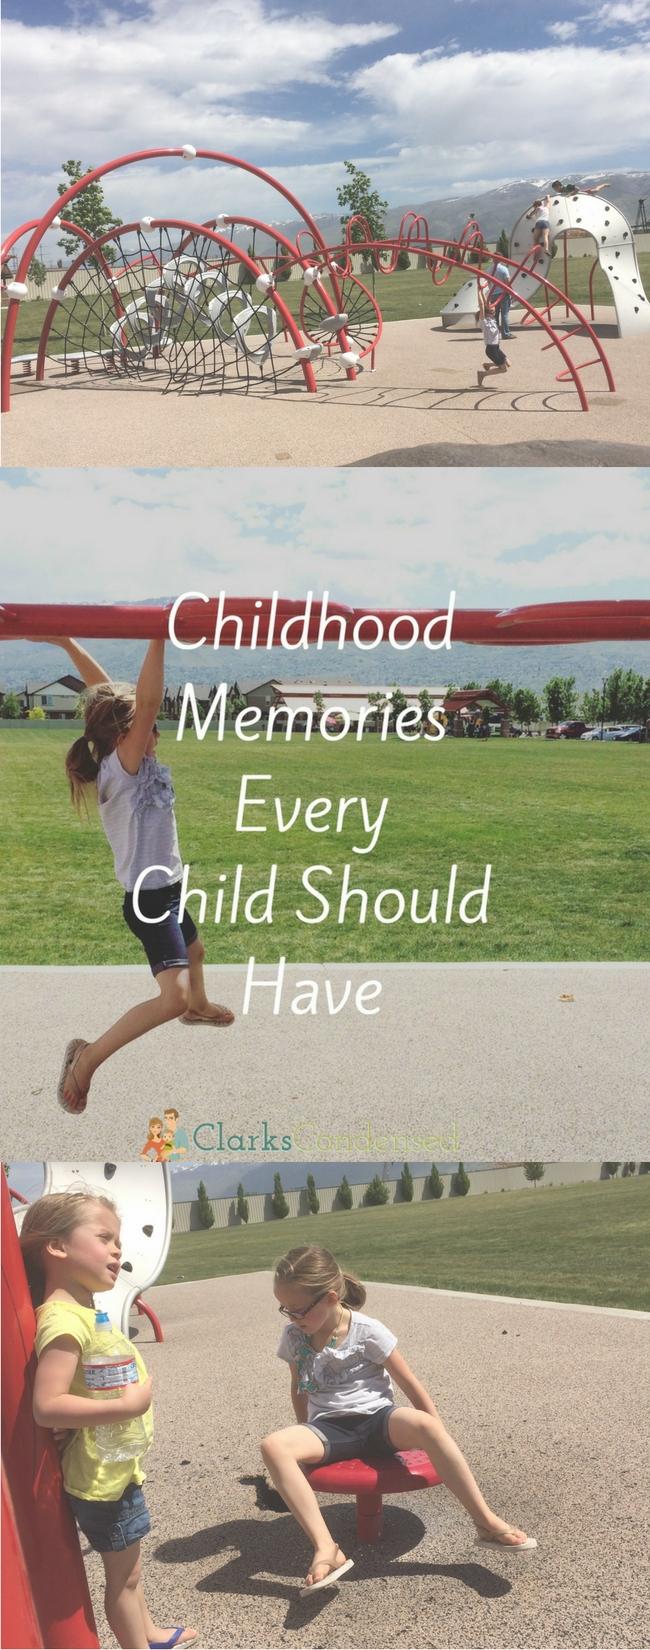 Childhood / Childhood games / children / let them be little / memories / motherhood